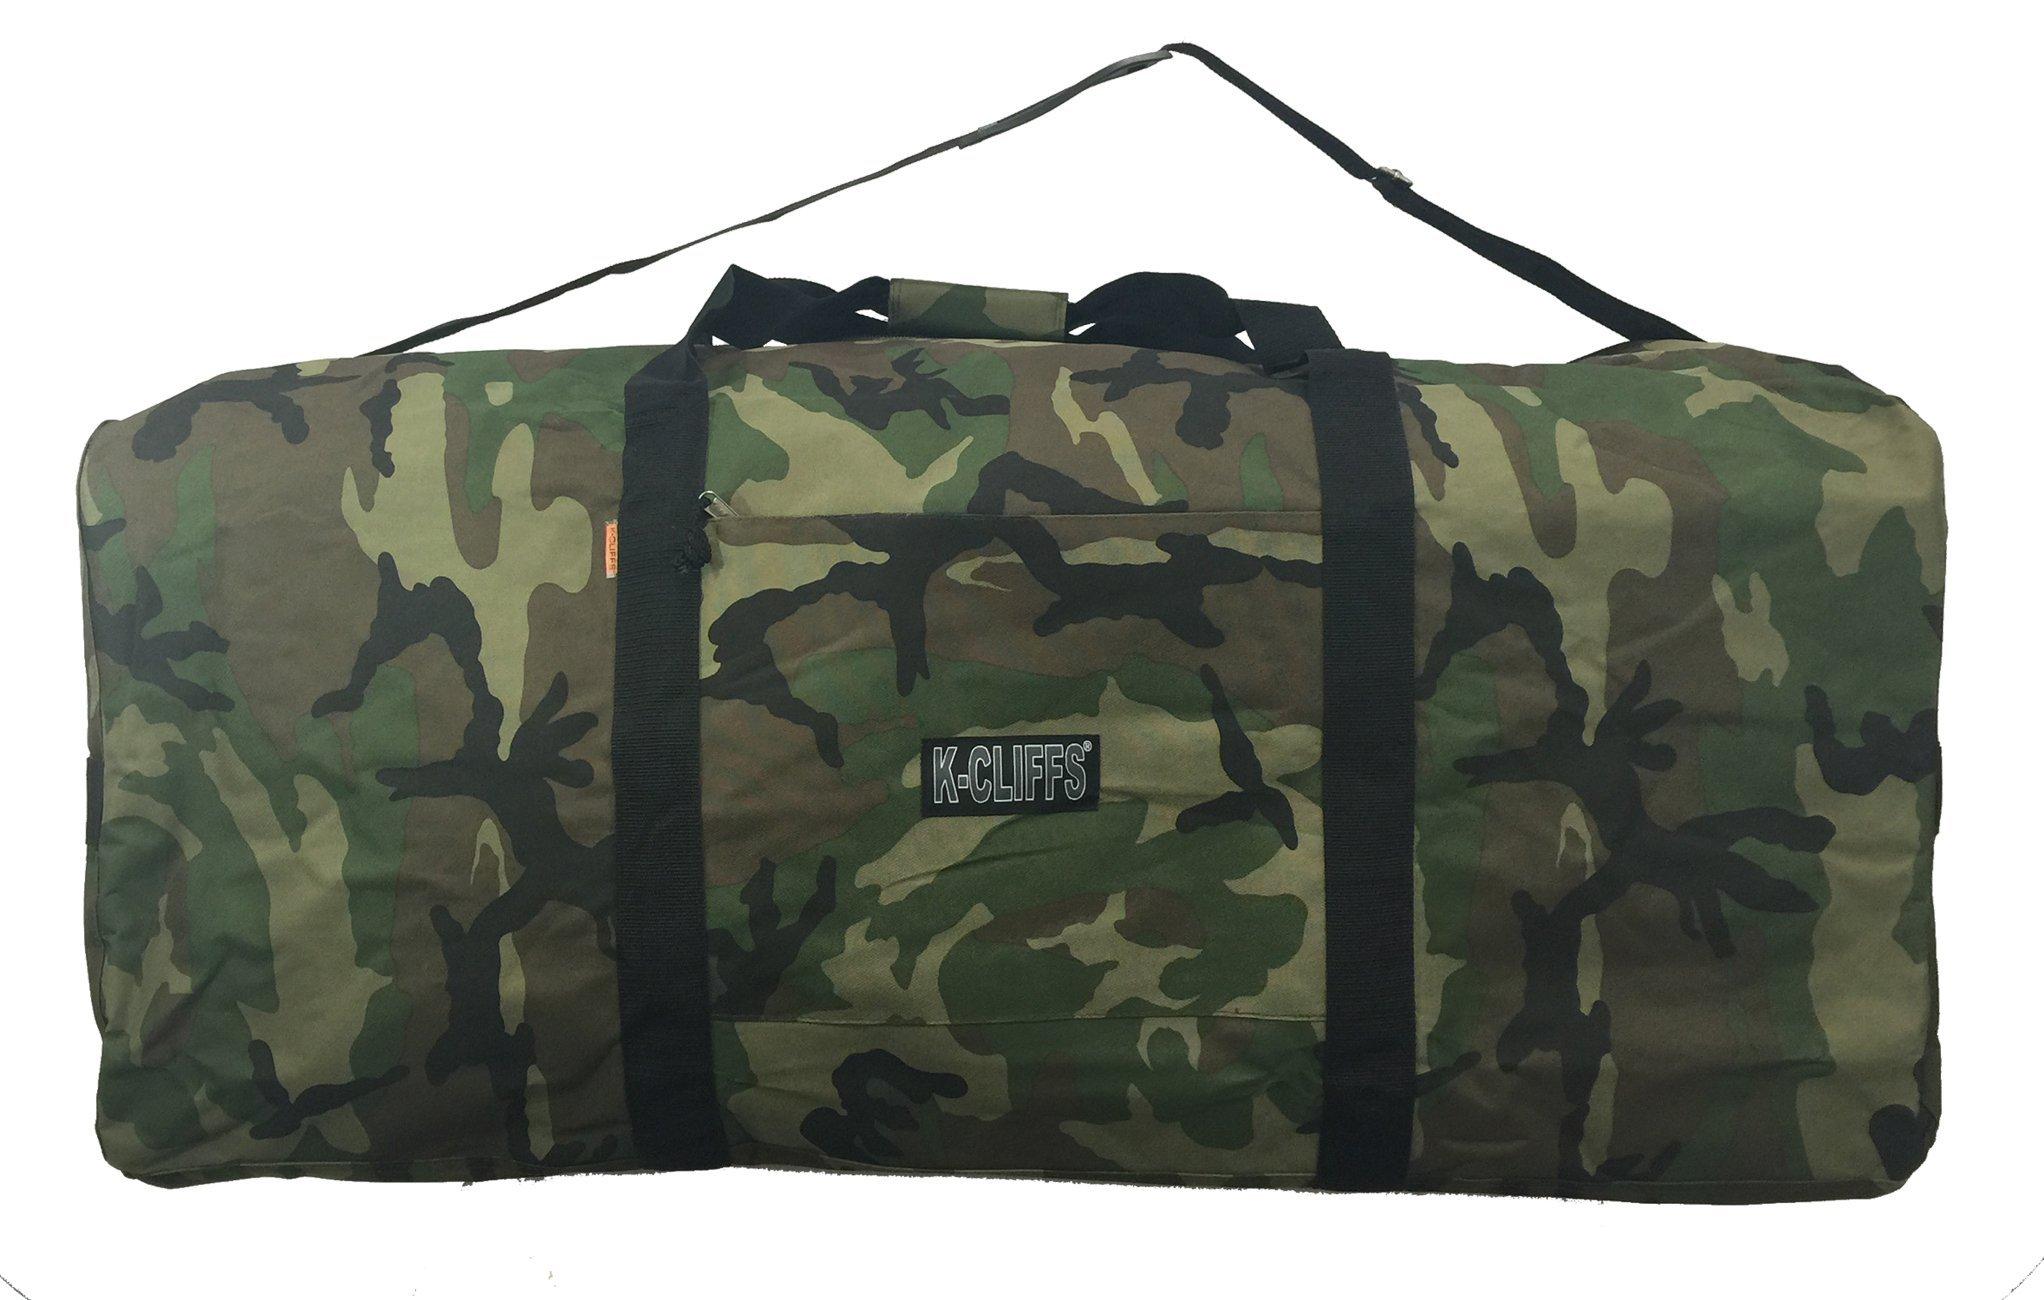 K-Cliffs Heavy Duty Cargo Duffel Camo Large Sport Gear Drum Set Equipment Hardware Travel Rooftop Rack Bag 42 Inch Camo